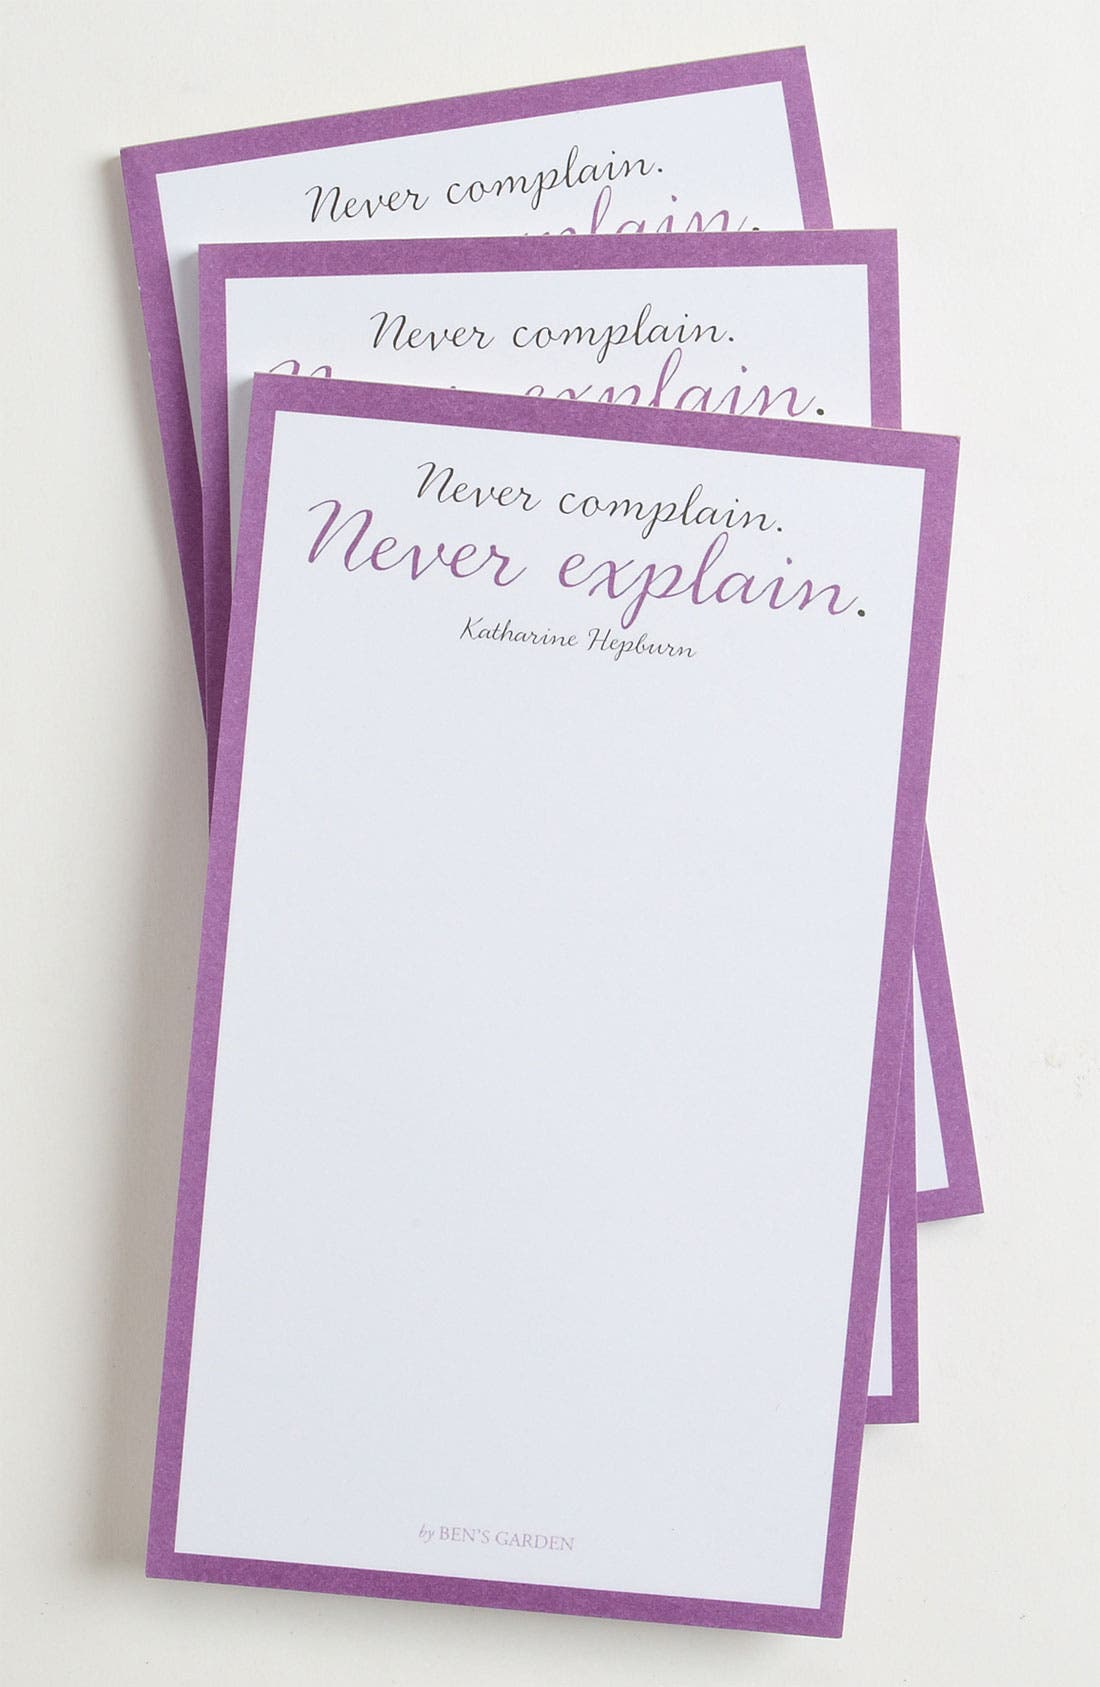 Main Image - Ben's Garden 'Never Complain, Never Explain' Notepads (3-Pack)